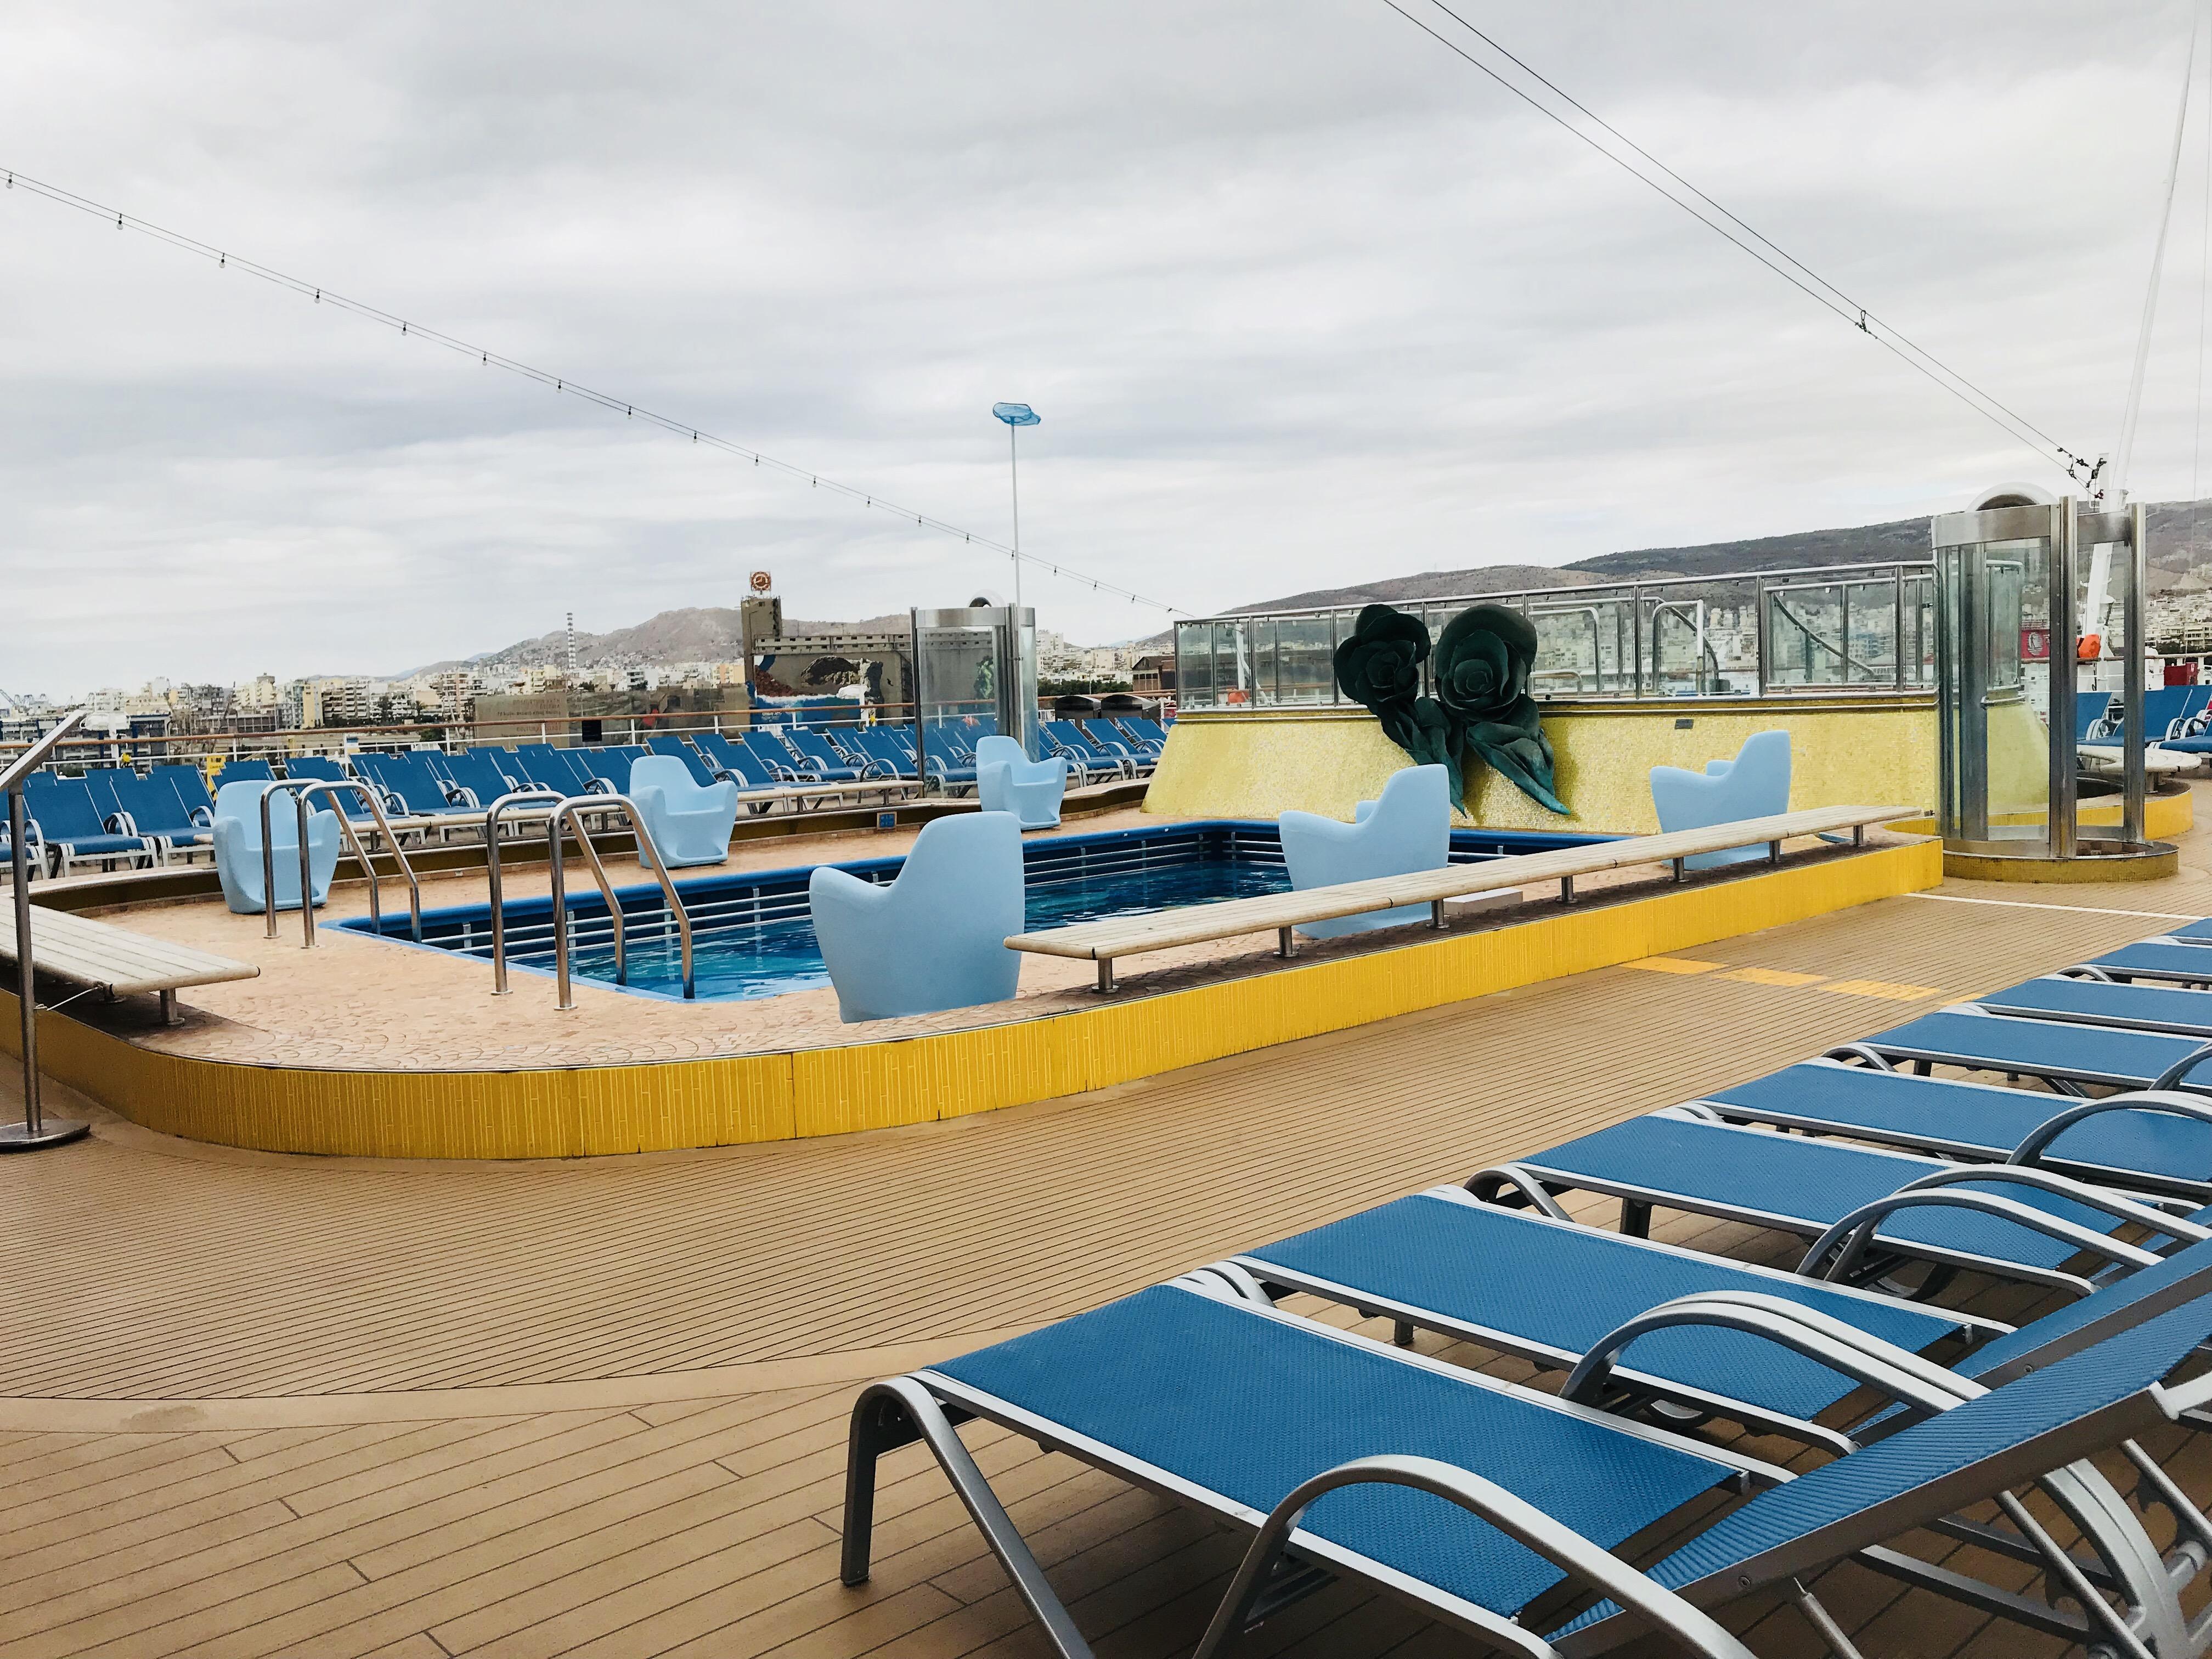 Costa luminosa et la femme allong e blog d 39 une fan de - Costa luminosa piscine ...